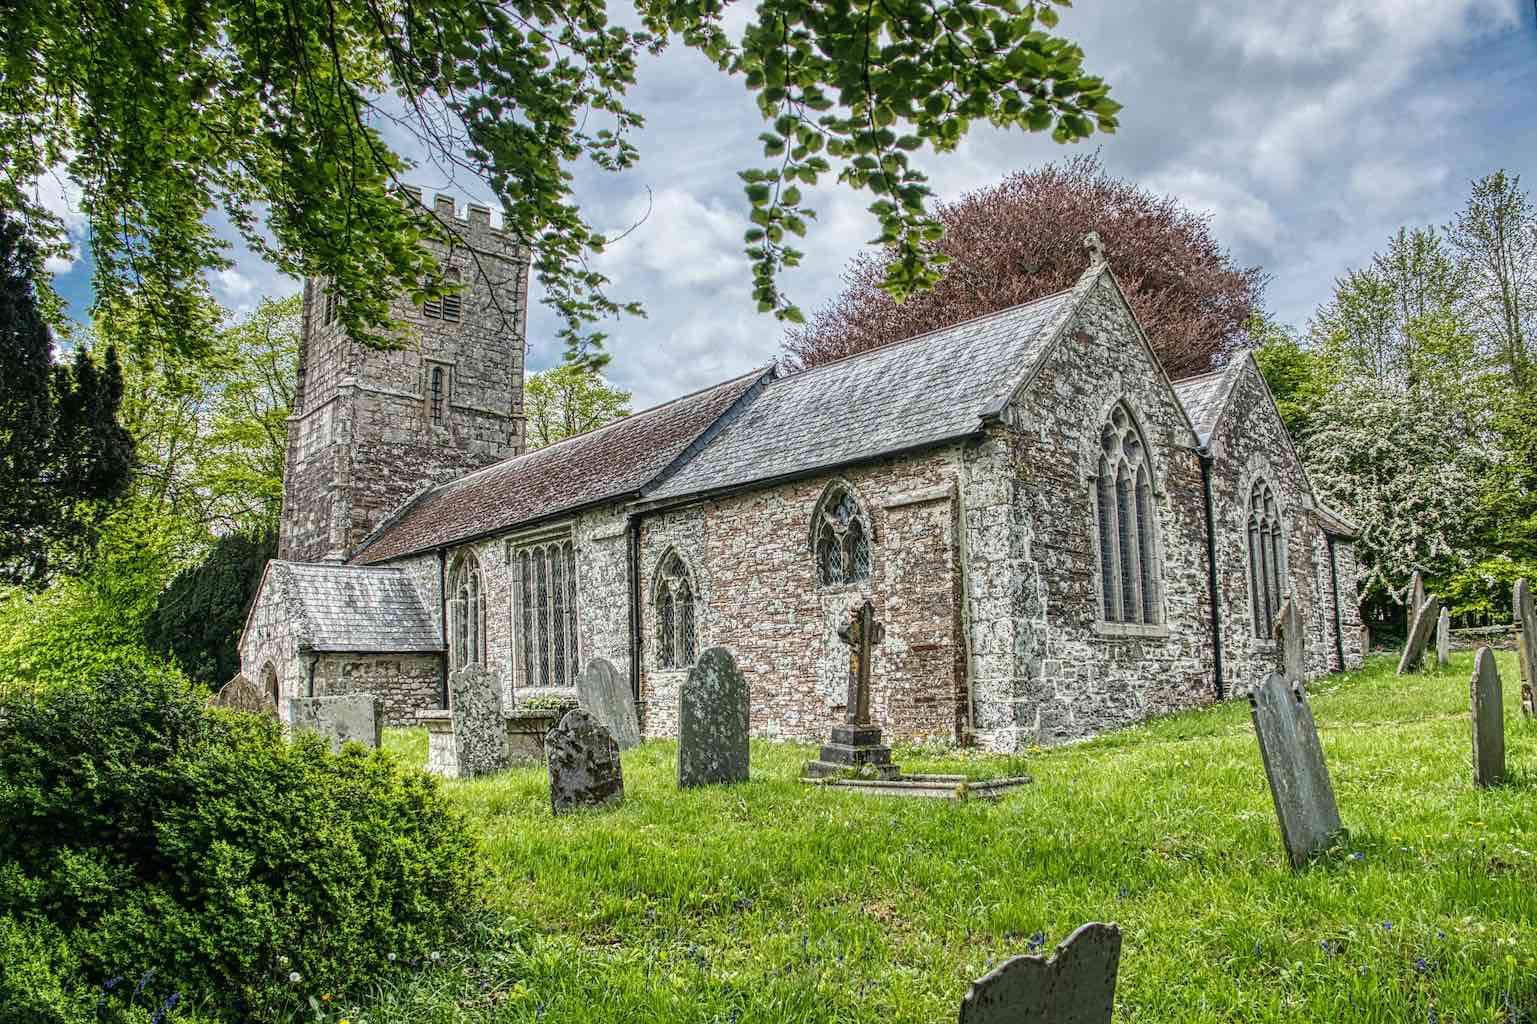 The 15th century Marystow Church of St Mary The Virgin